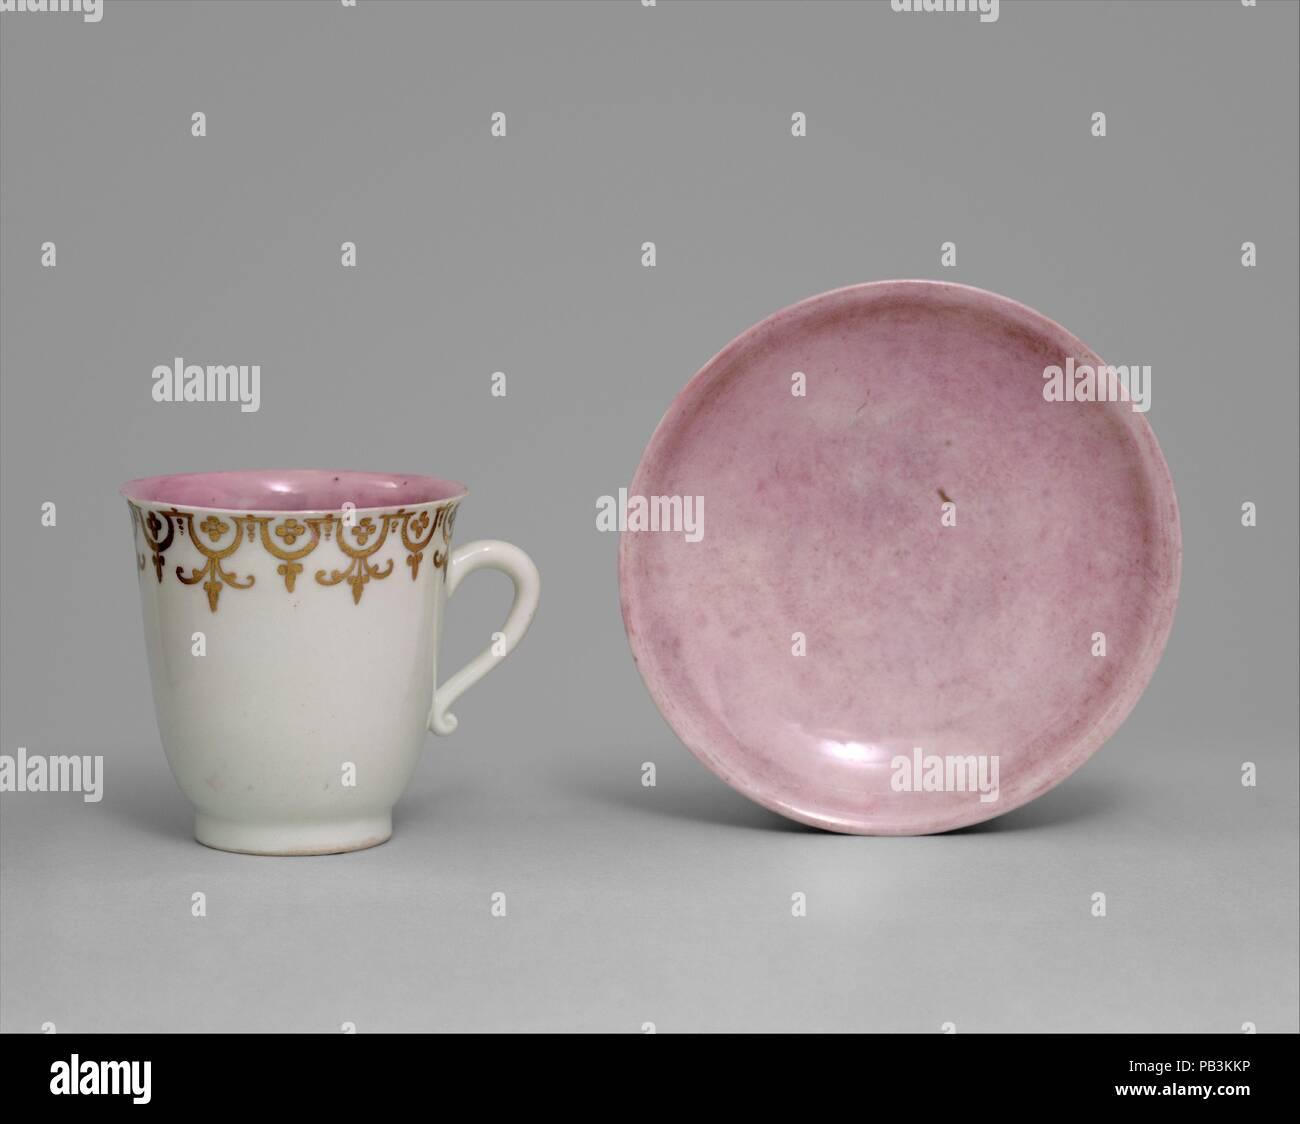 Results 1 - 48 of 1293. German Meissen Porcelain Blue Onion Tea Cup & Saucer Gilded Edge.